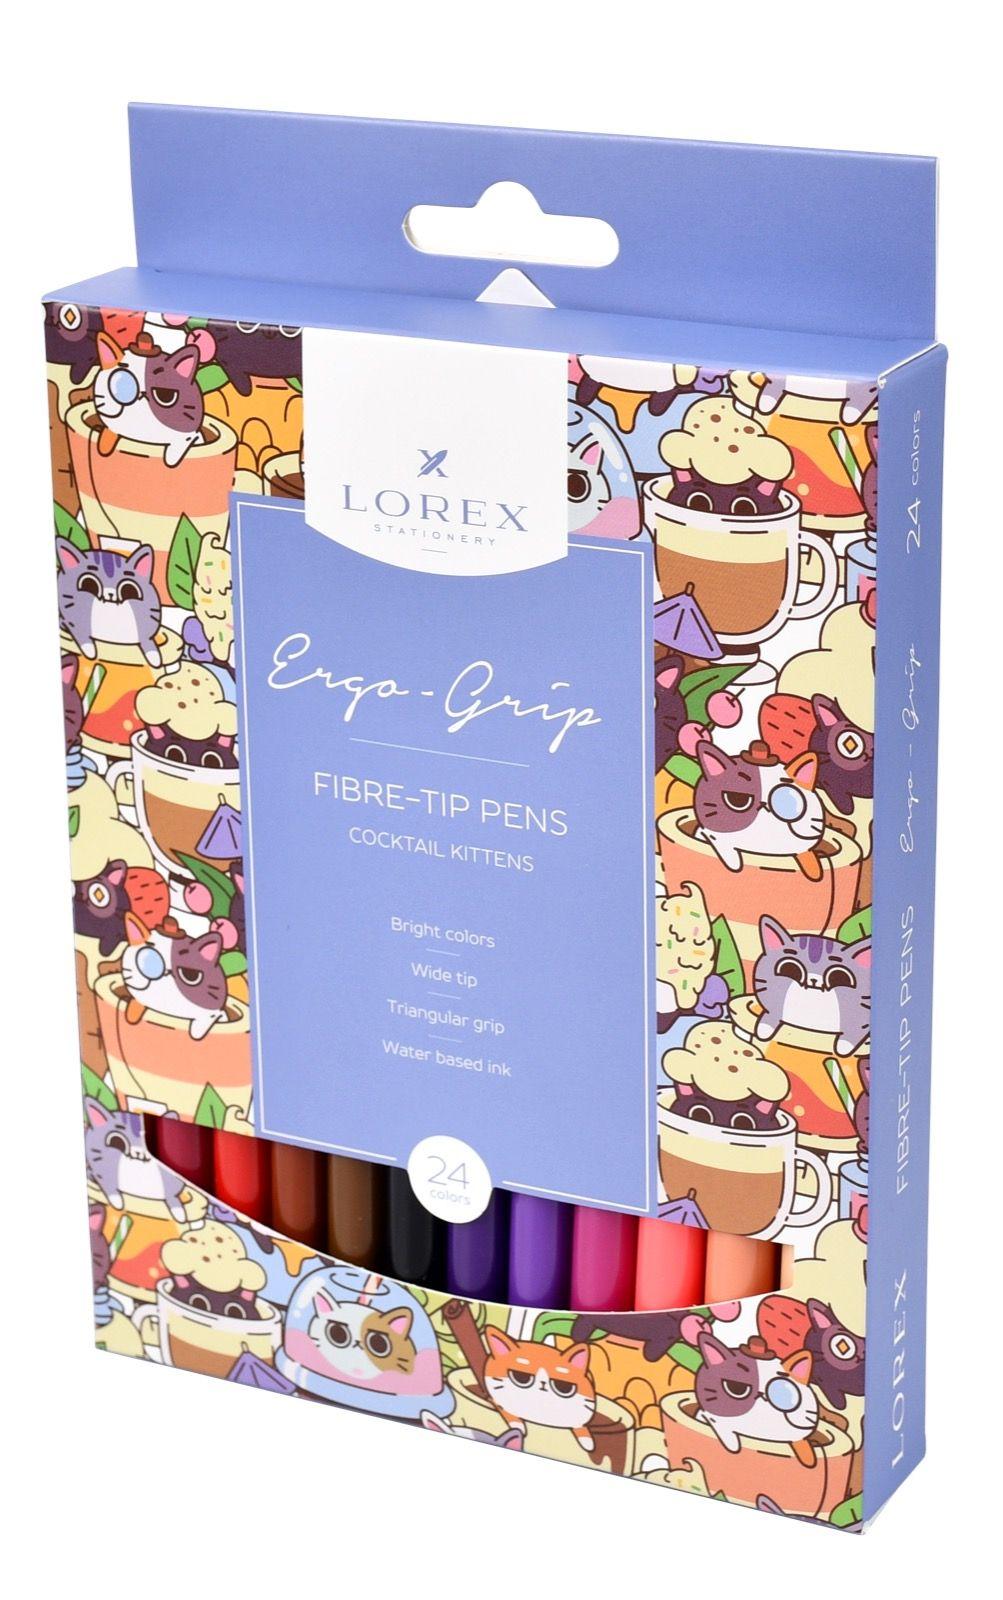 Фломастеры LOREX ERGO-GRIP COCKTAIL KITTENS 24 цв. с трехгранным захватом